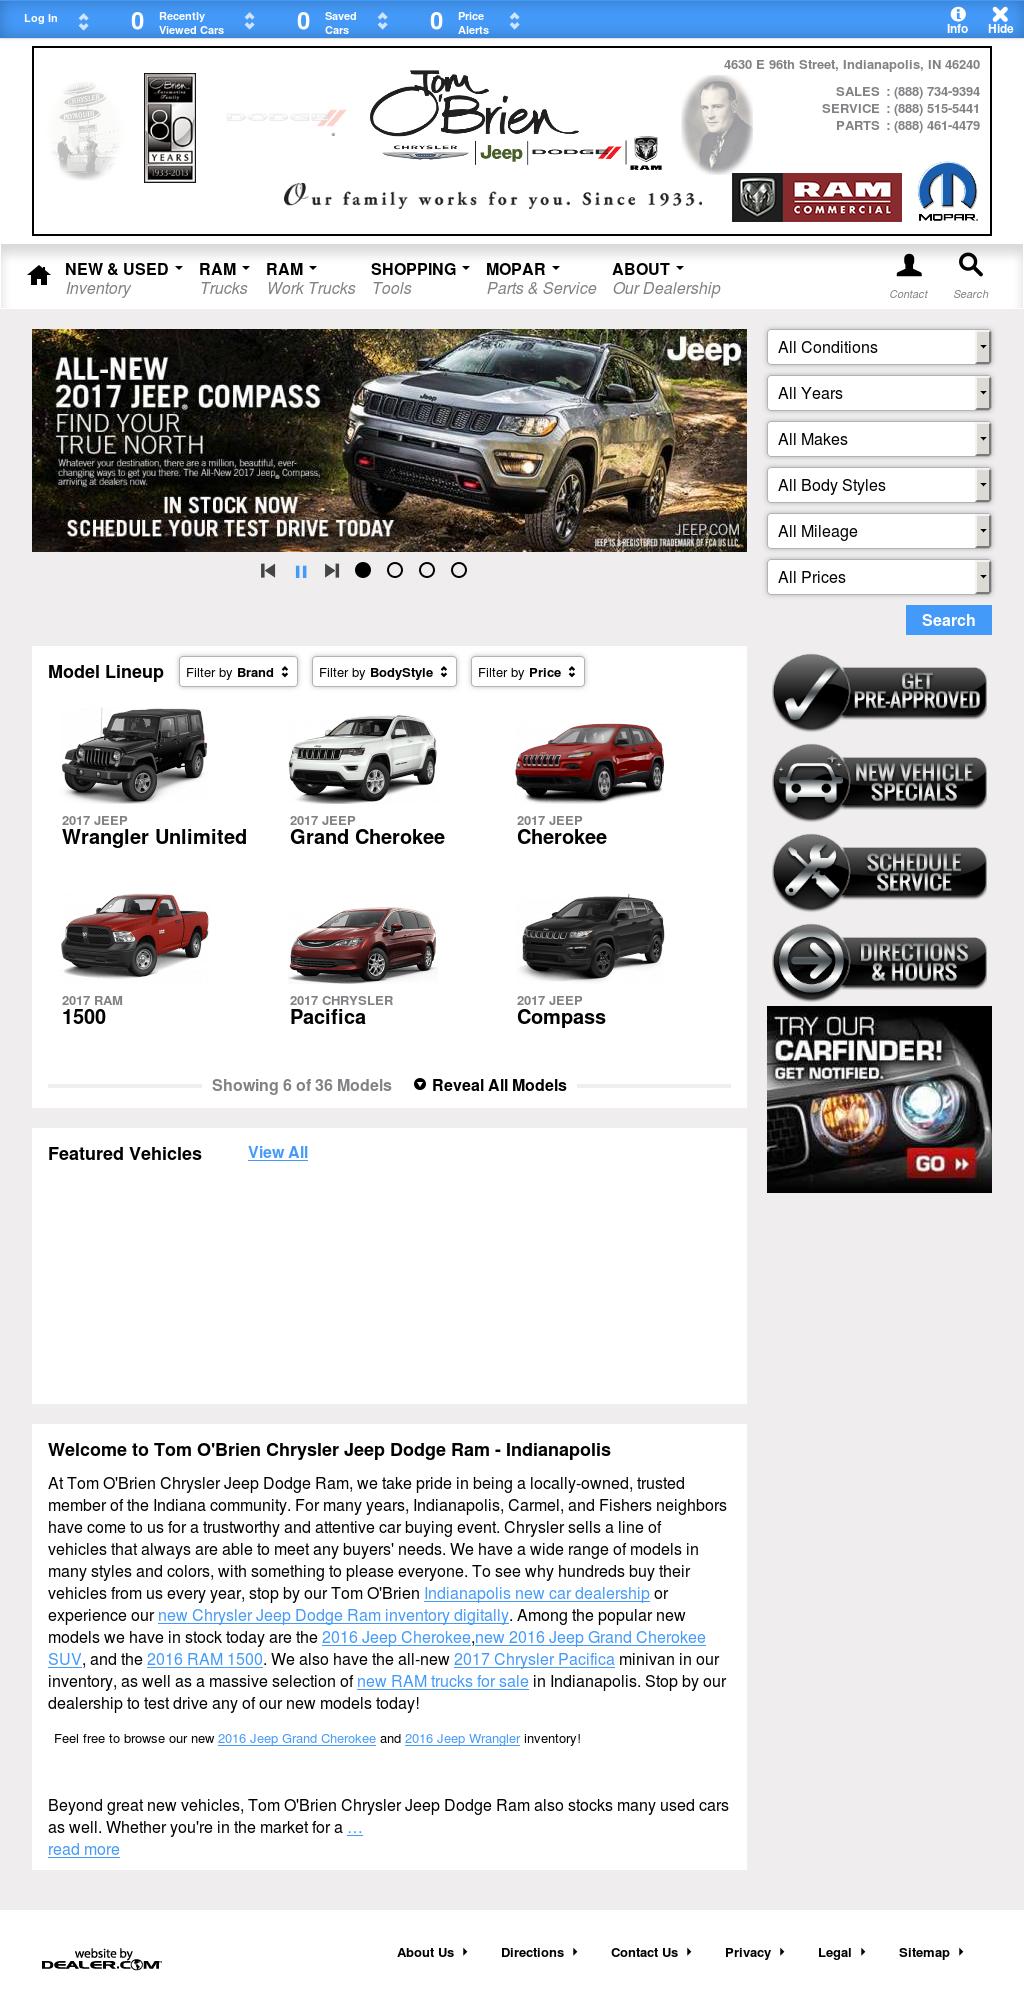 Tom Ou0027brien Chrysler Jeep Dodge Ram   Indianapolis Website History